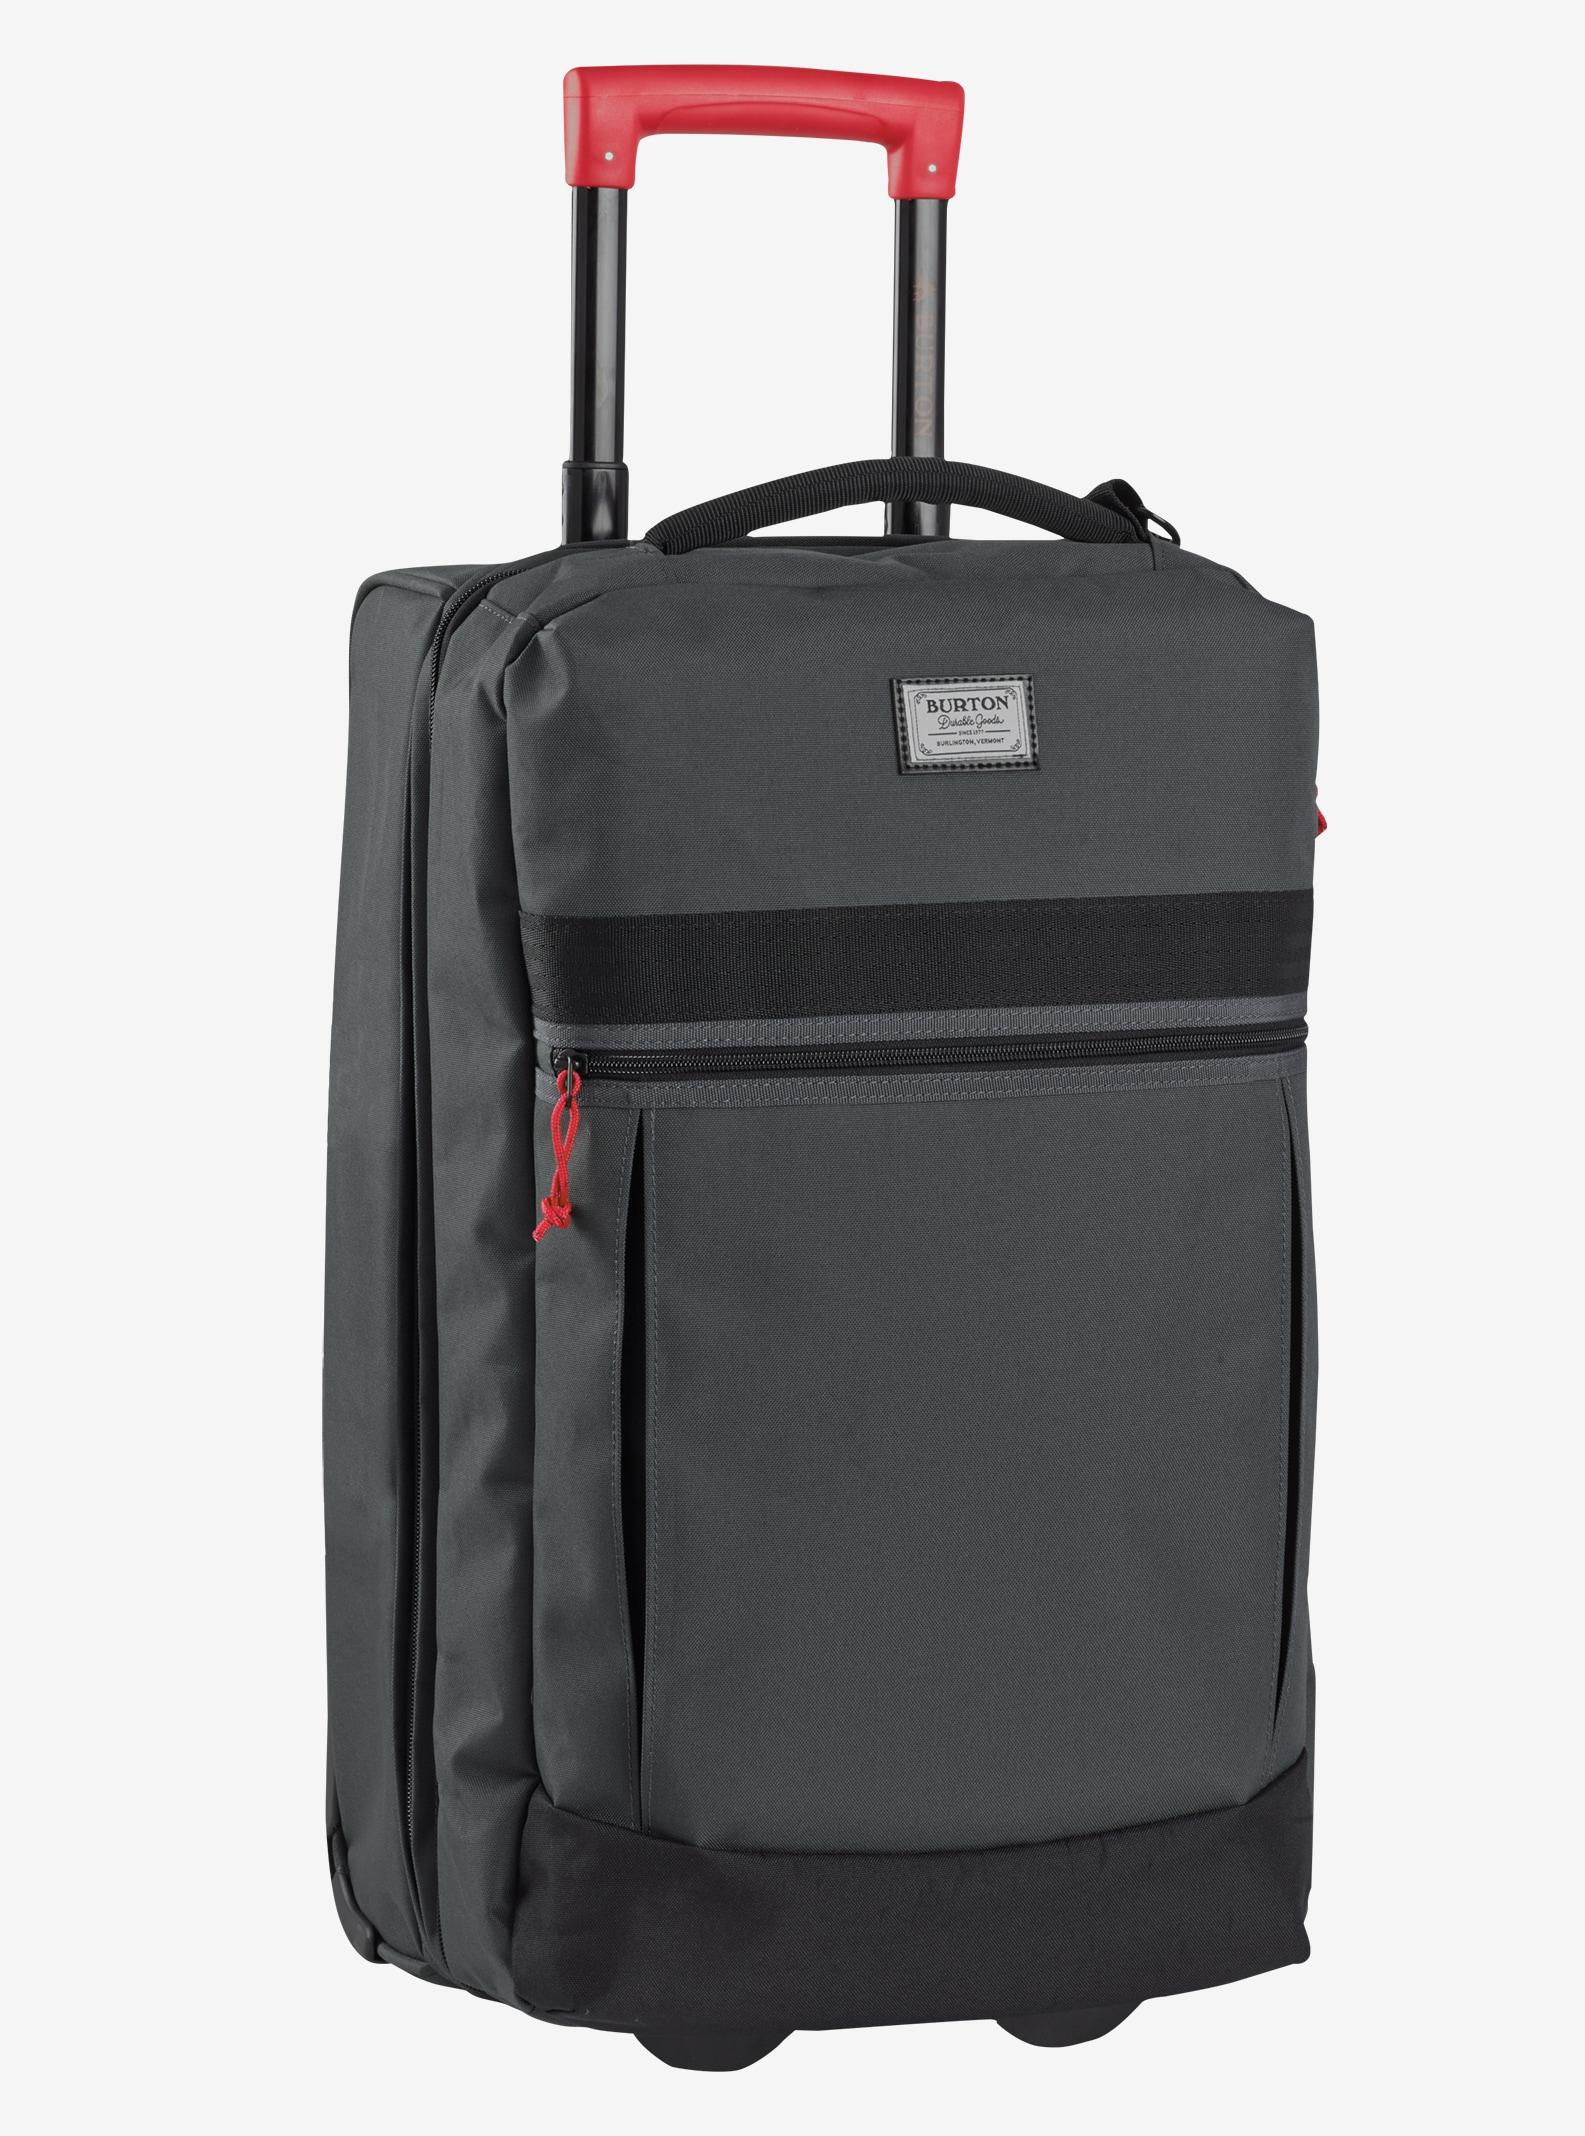 Burton Charter Roller Travel Bag shown in Blotto